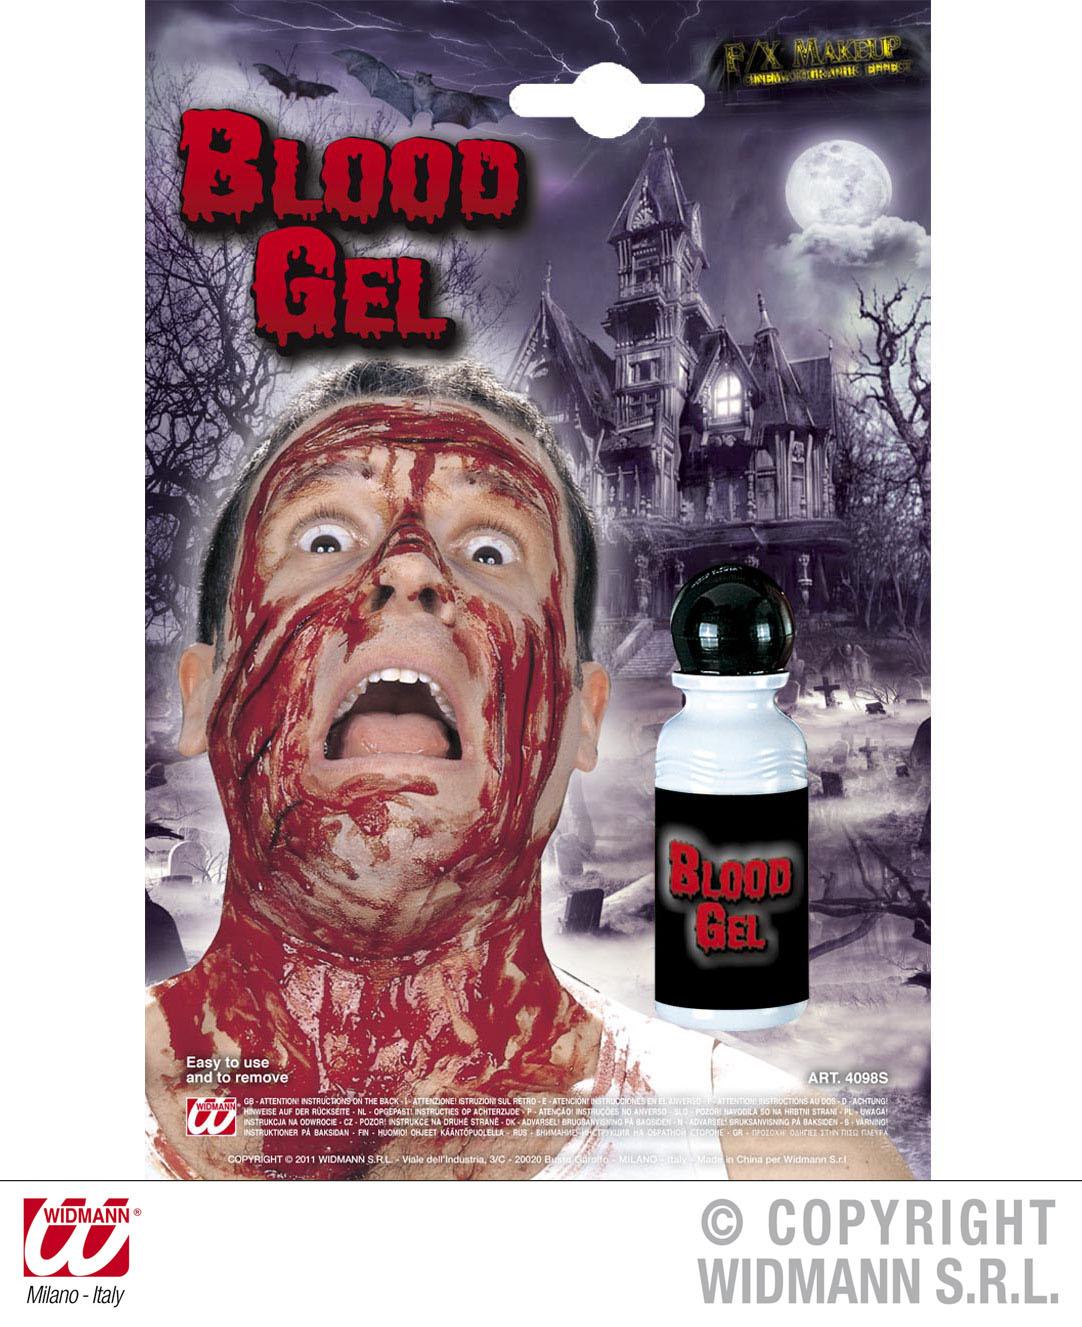 Blutgel  Filmblut Theaterblut, Blut Flasche  Grusel HALLOWEEN   4098